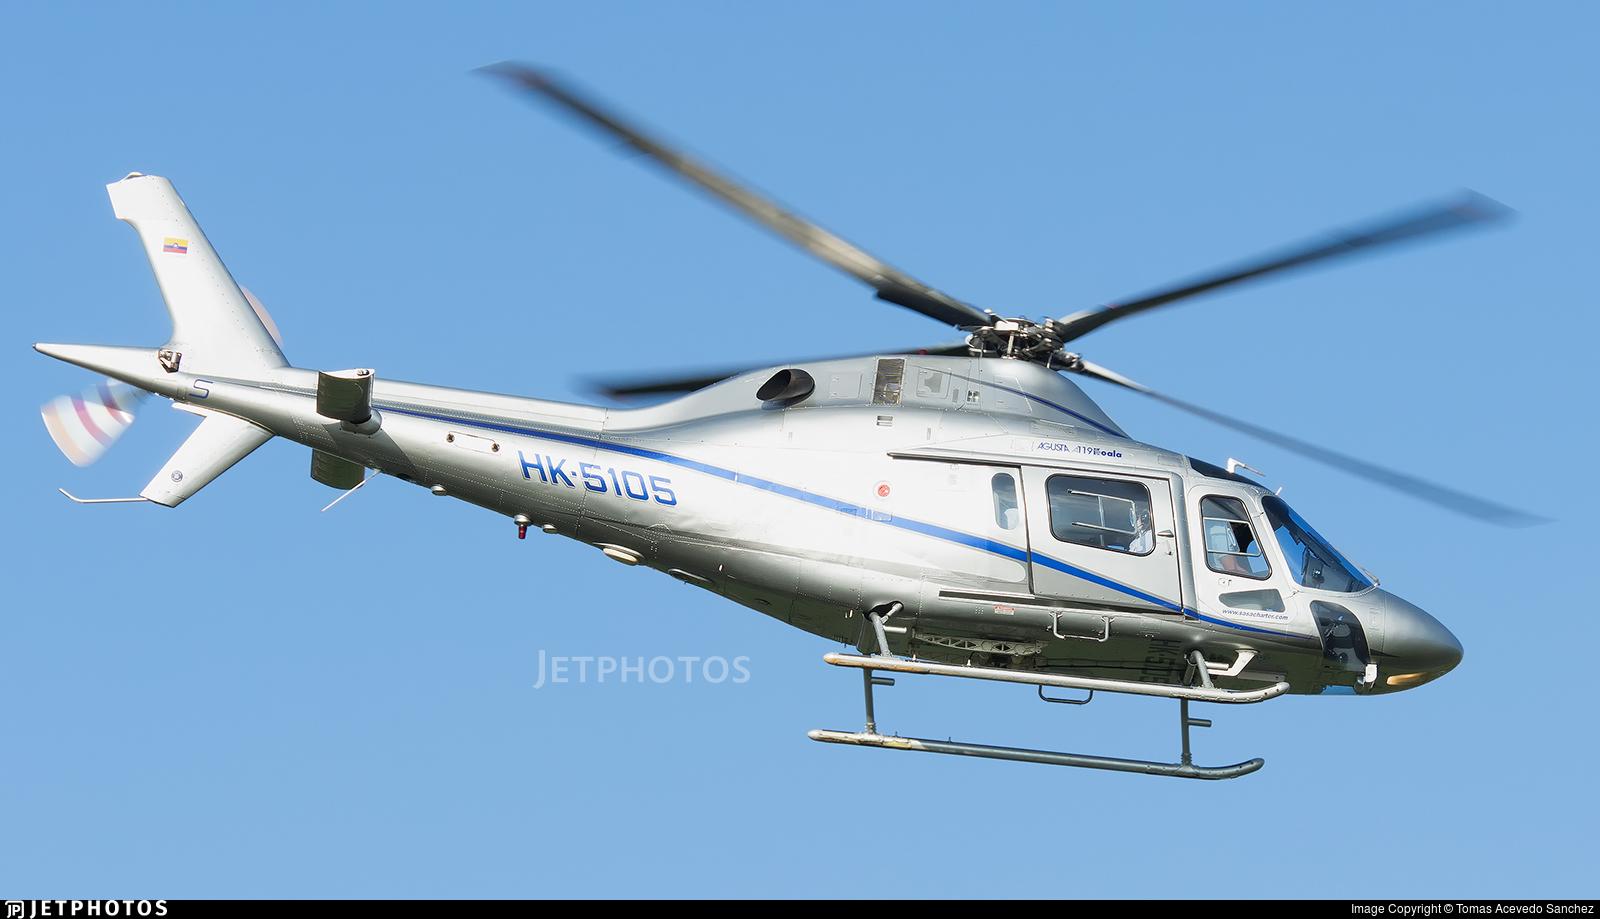 HK-5105 - Agusta A119 Koala - Sociedad Aeronáutica de Santander (SASA)